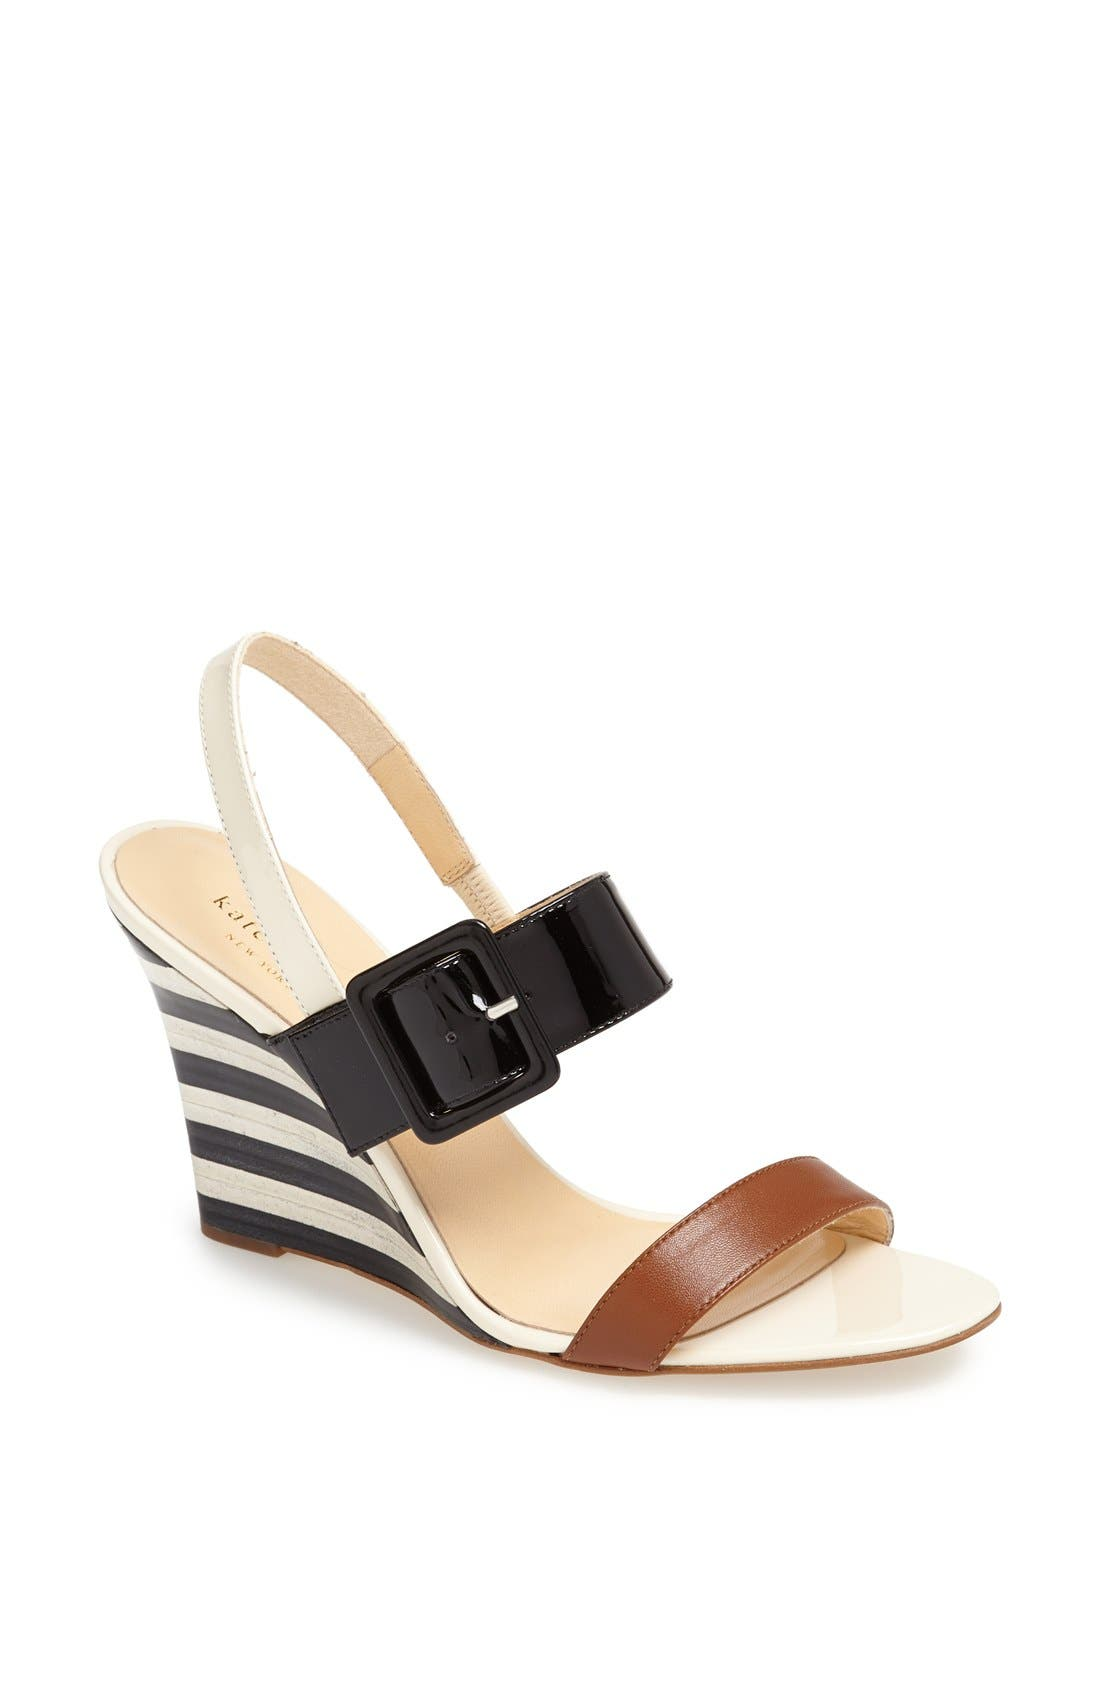 Main Image - kate spade new york 'isola' wedge sandal